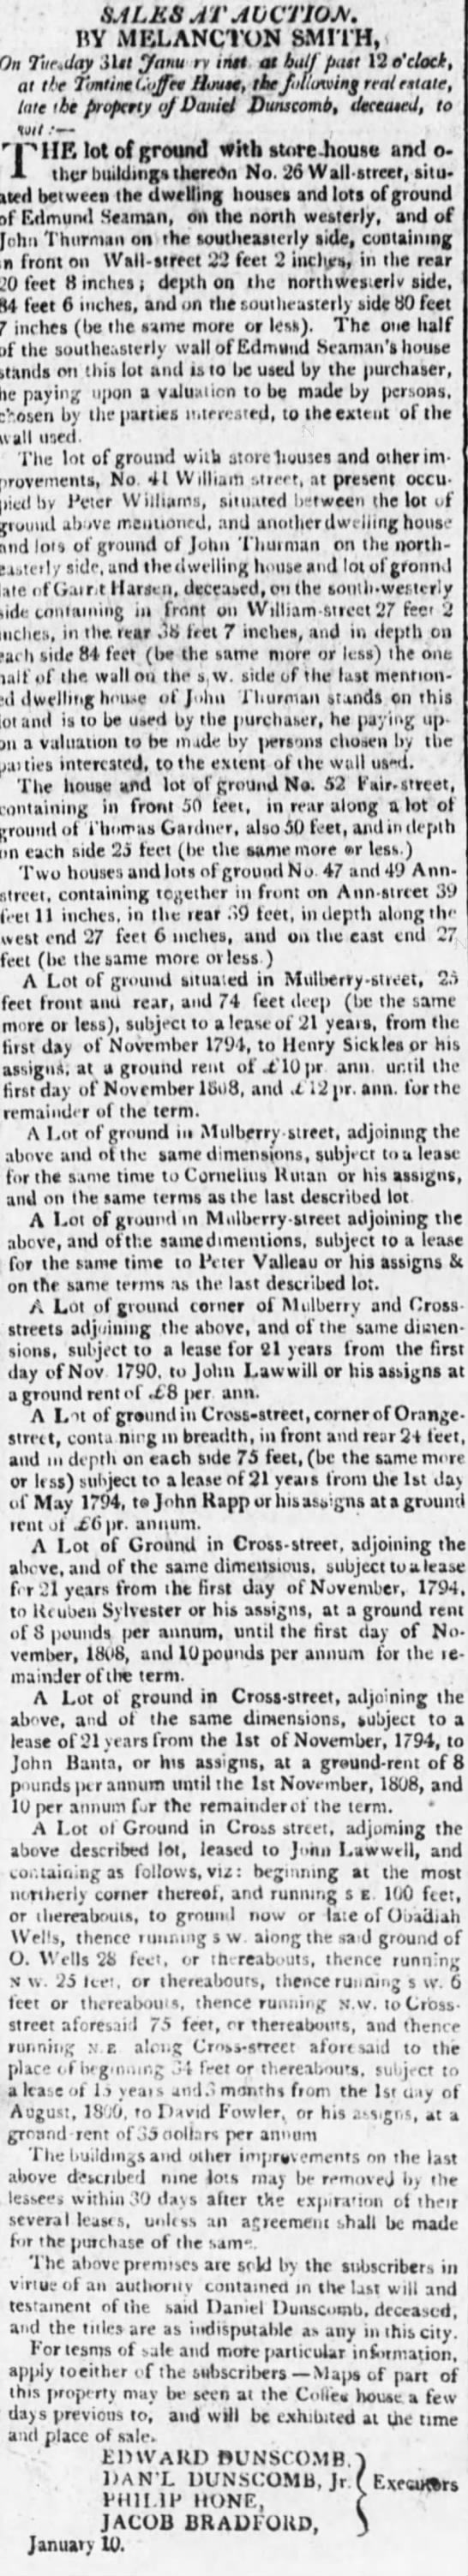 John Rapp May 1794 property -